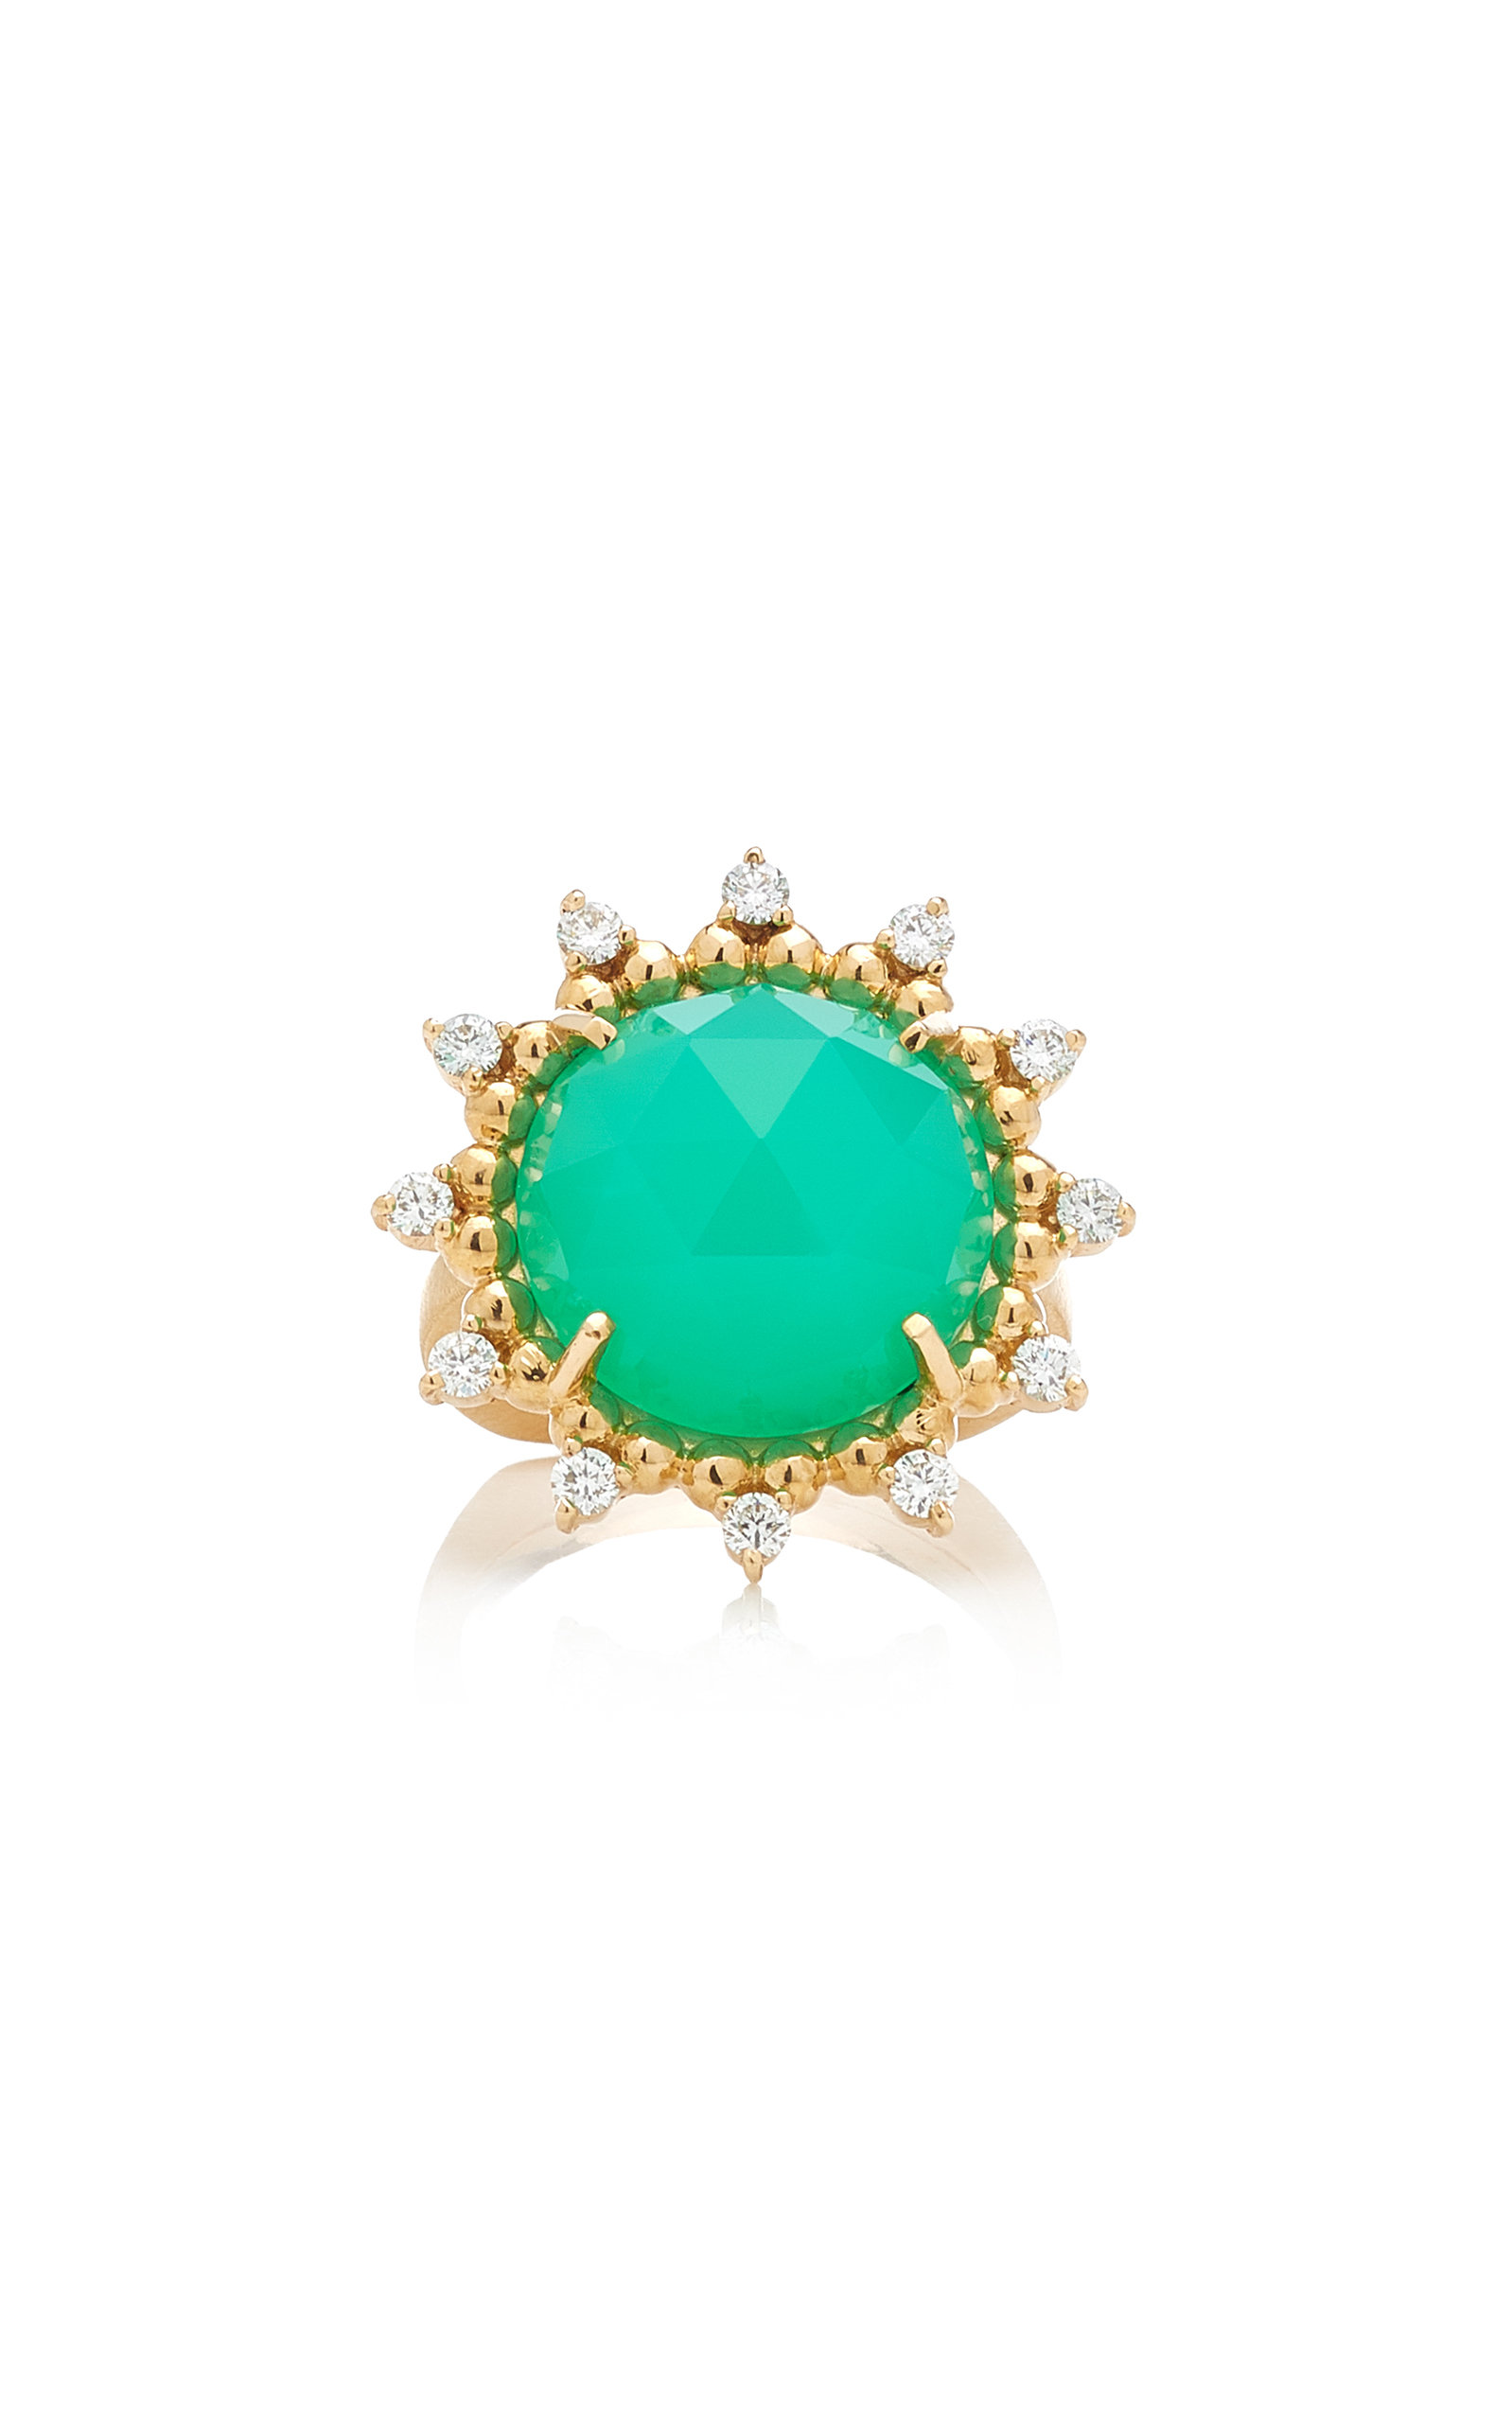 Women's Sunburst 14K Yellow Gold Chrysoprase and Diamond Ring